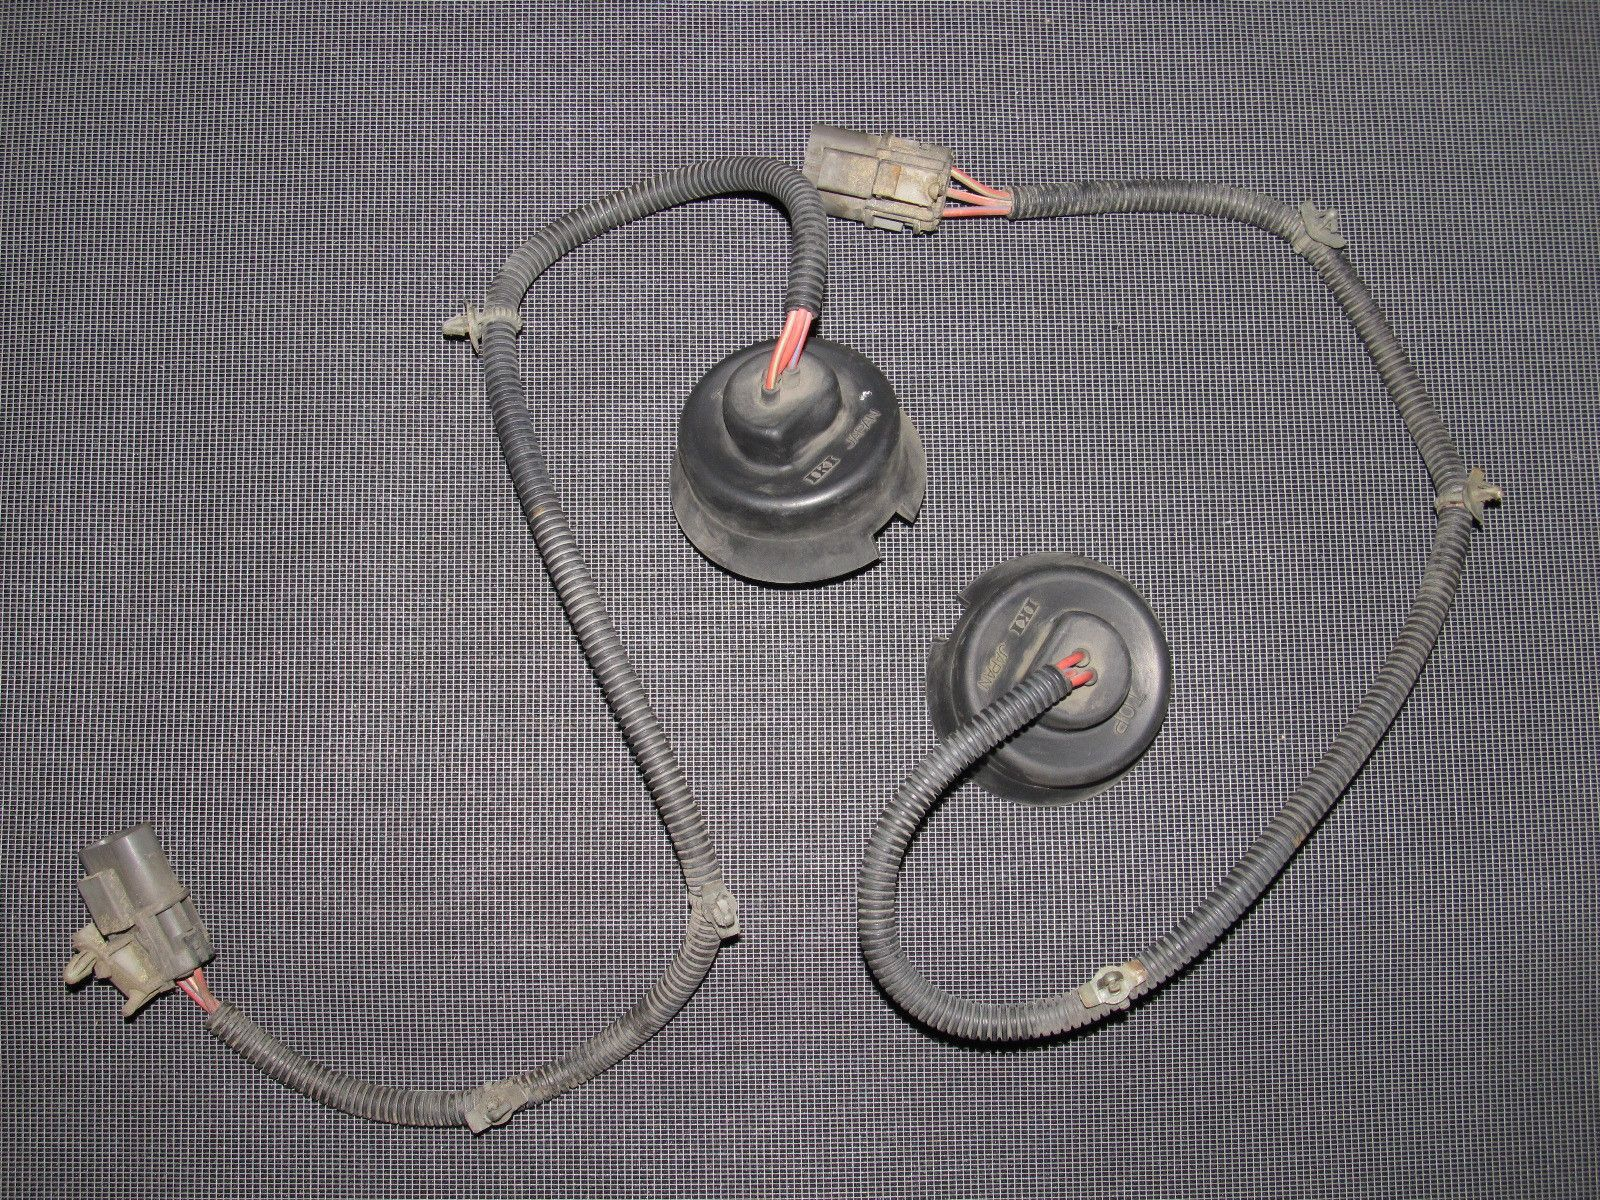 hight resolution of 240sx headlight wiring wiring diagram database 1989 nissan 240sx headlight wiring 240sx headlight wiring